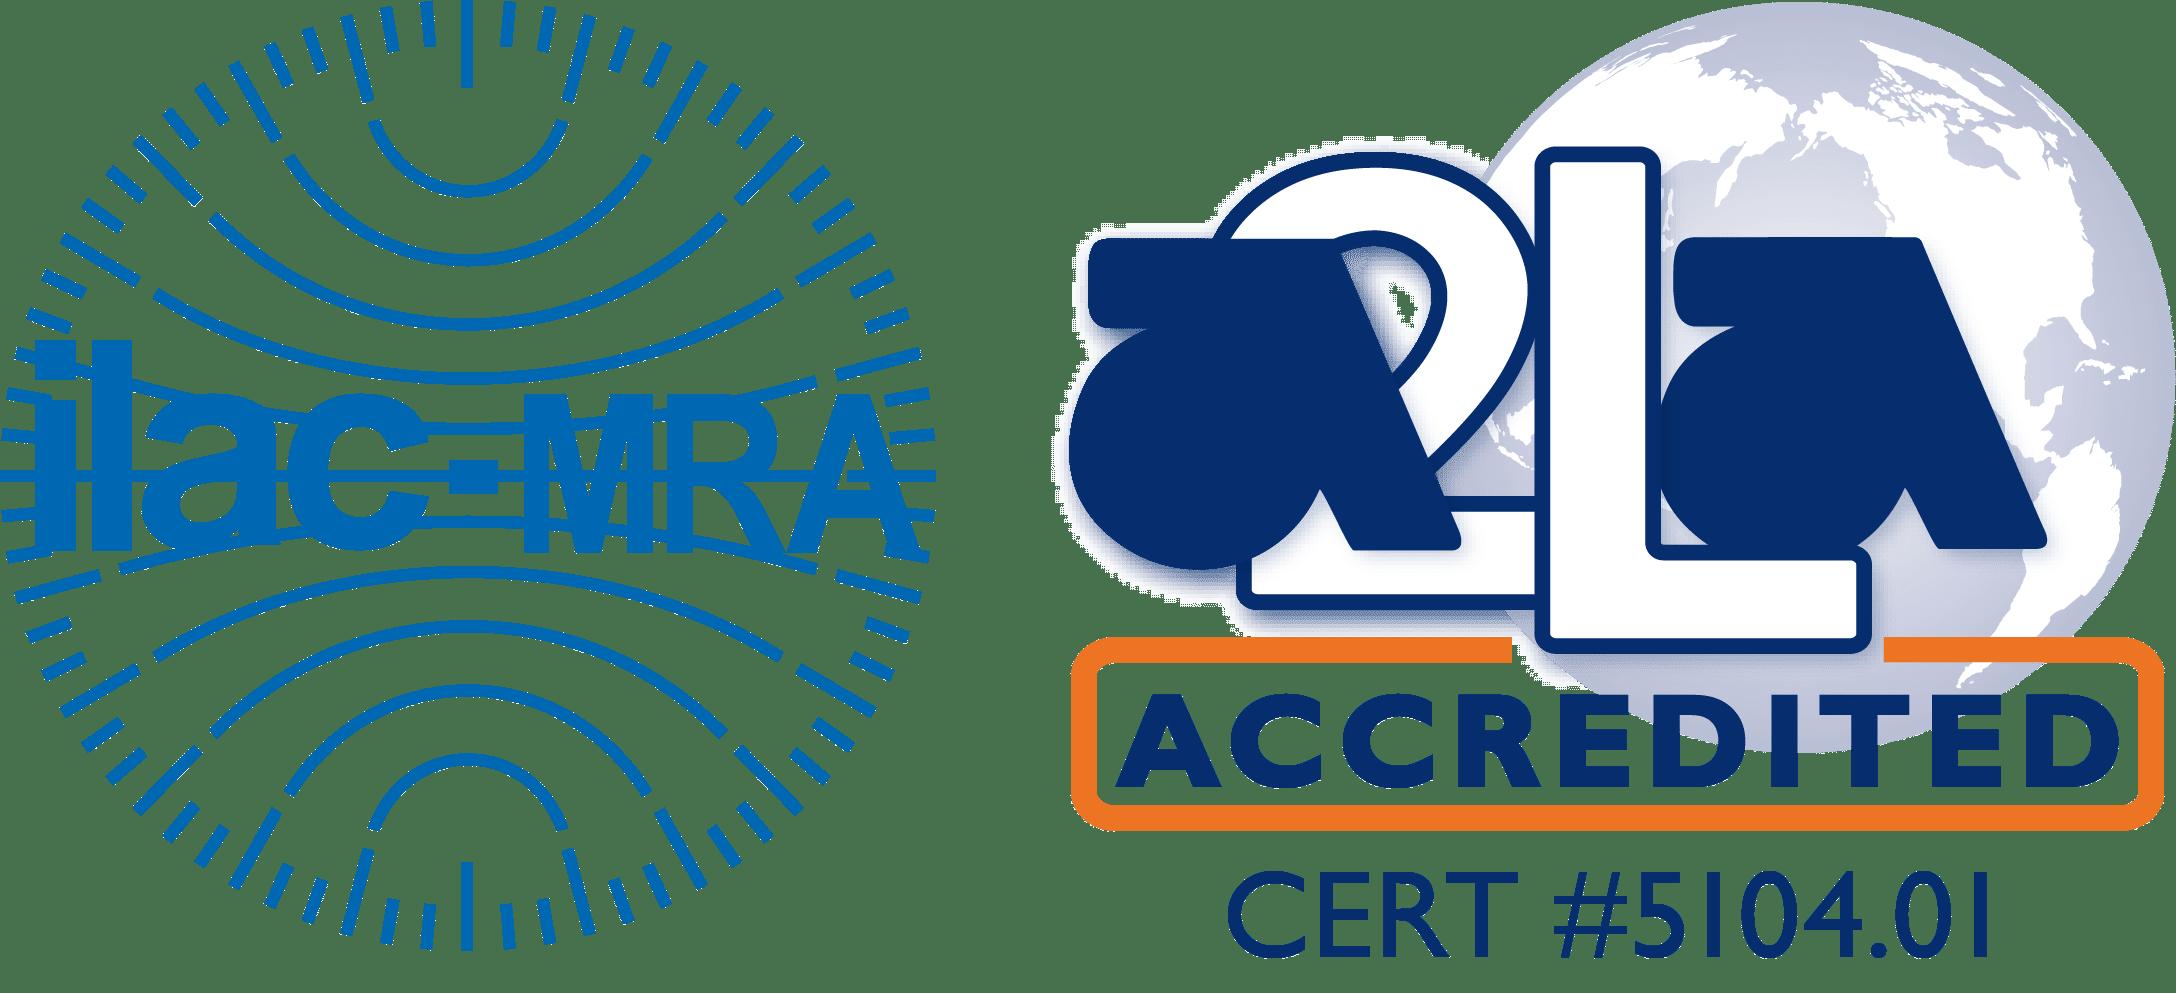 ILAC MRA-A2LA Accredited Symbol 5104.01 - Santa Fe Springs